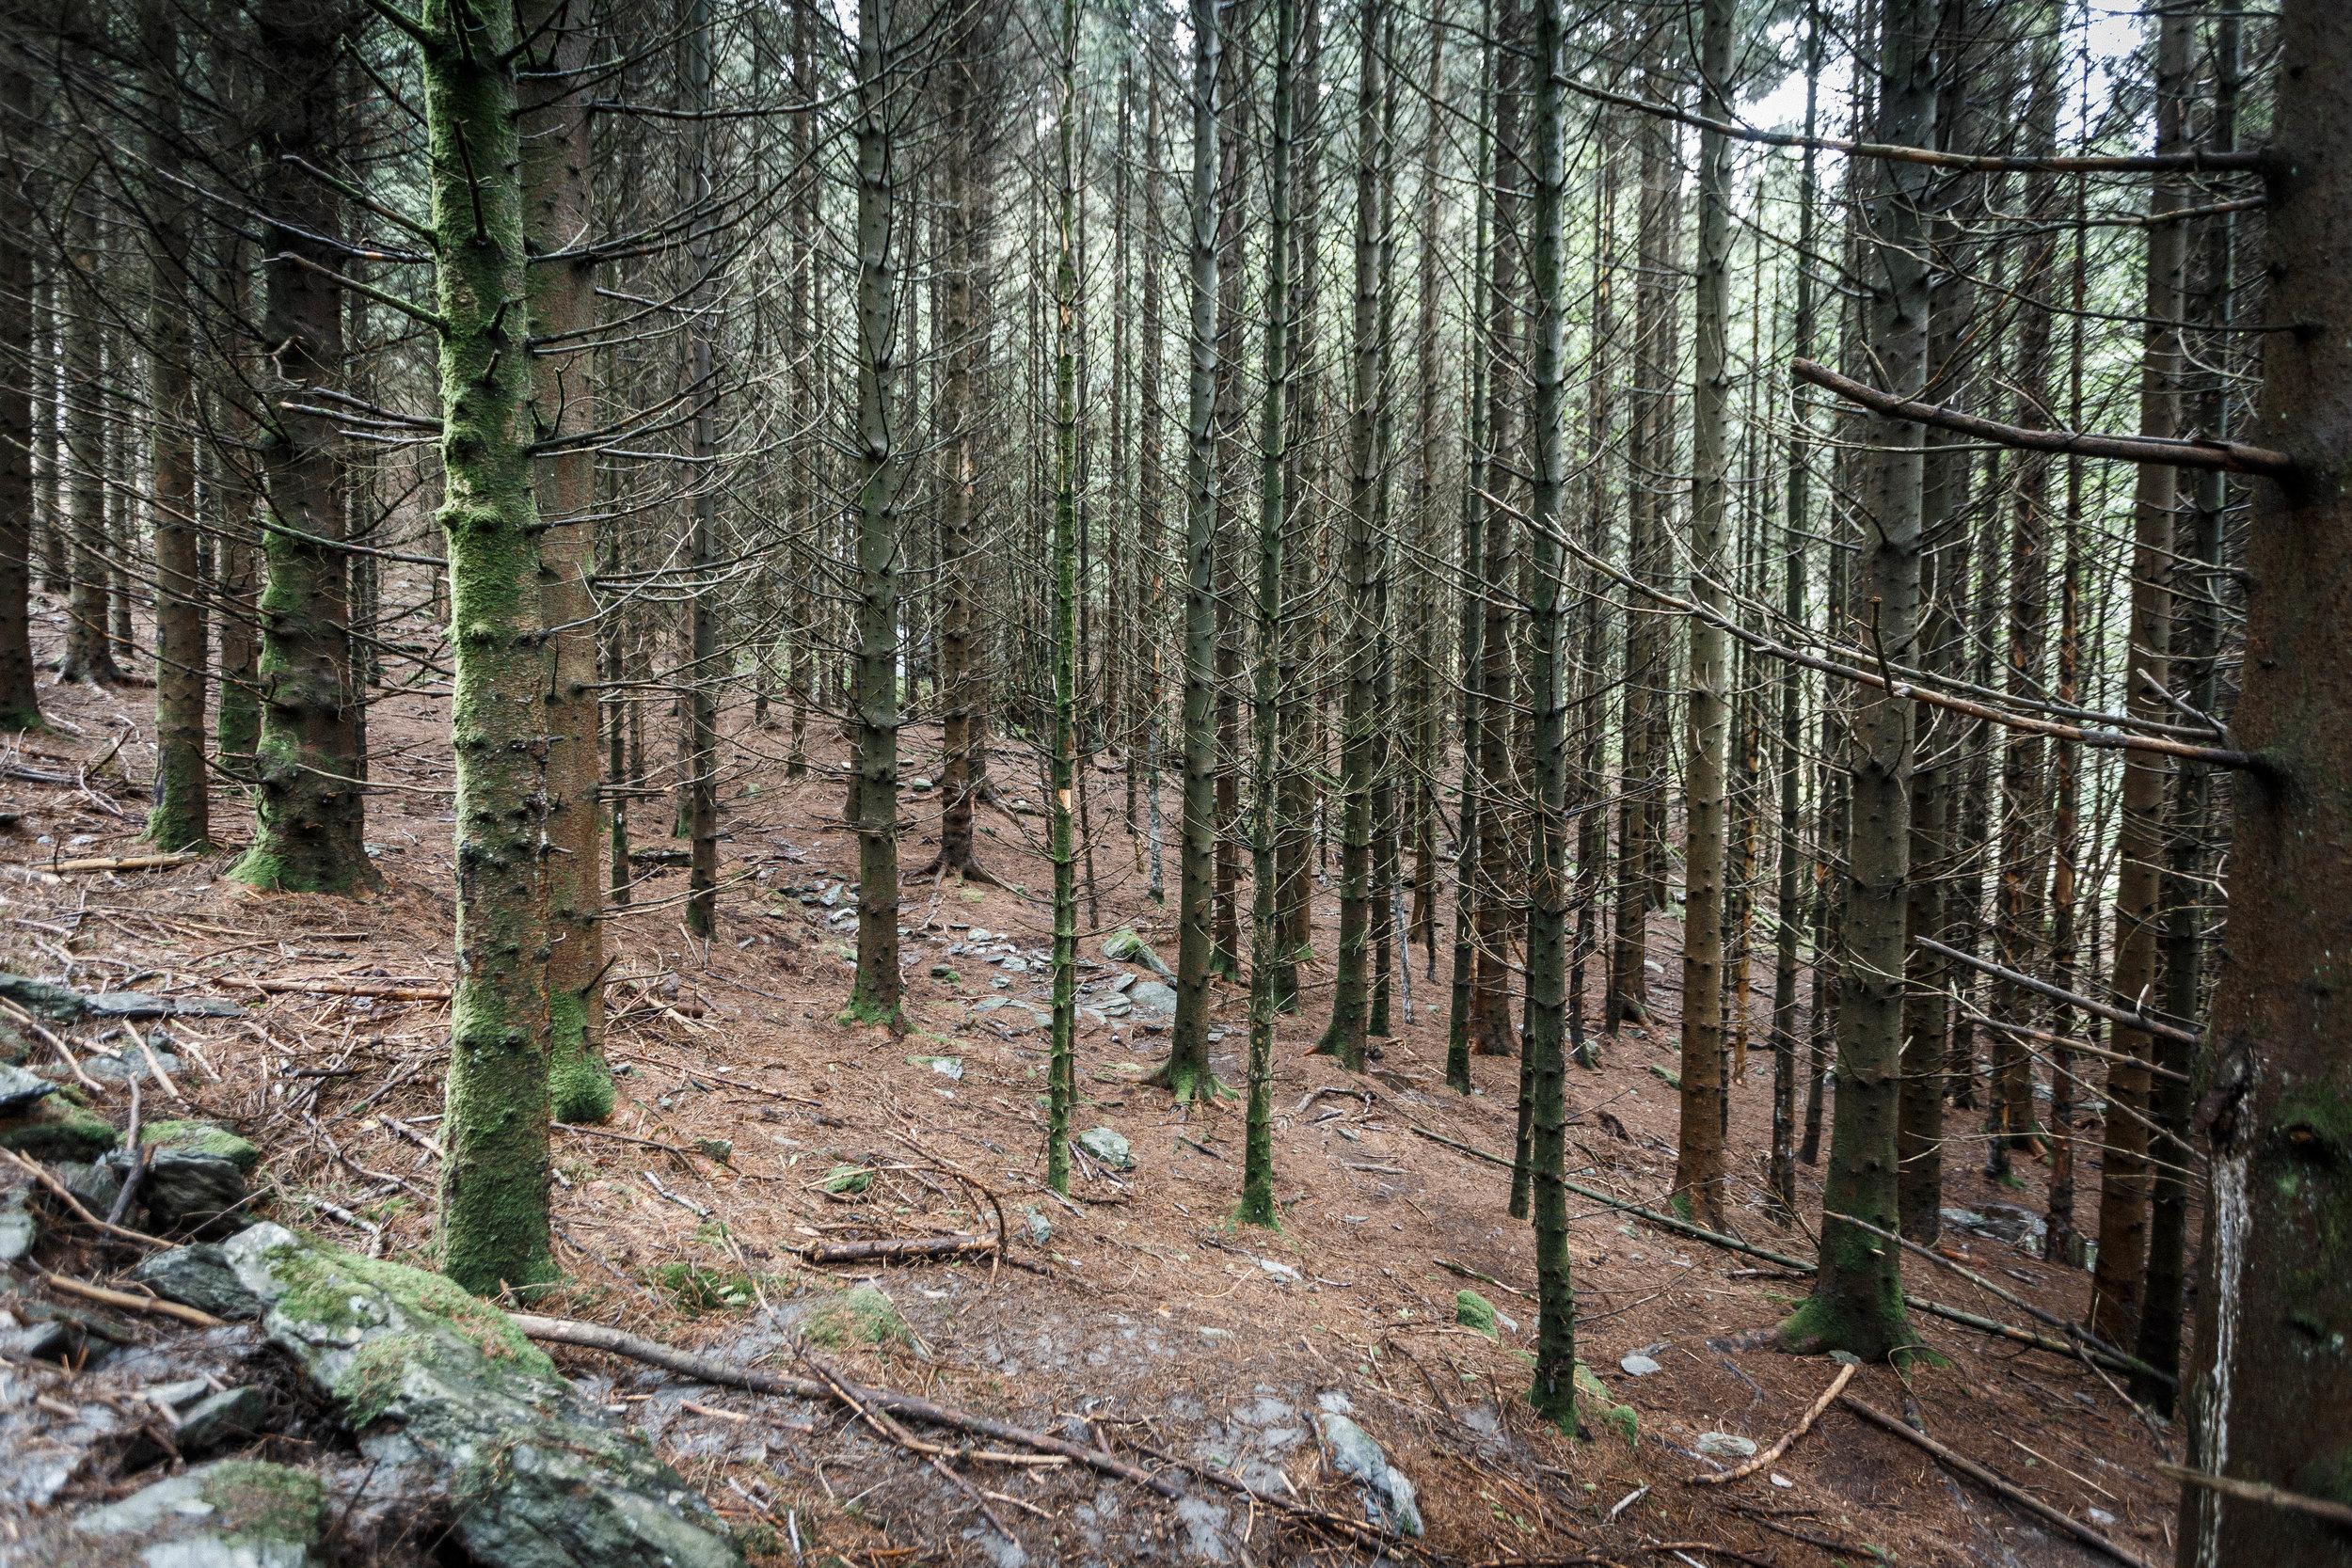 North_forest_12.jpg